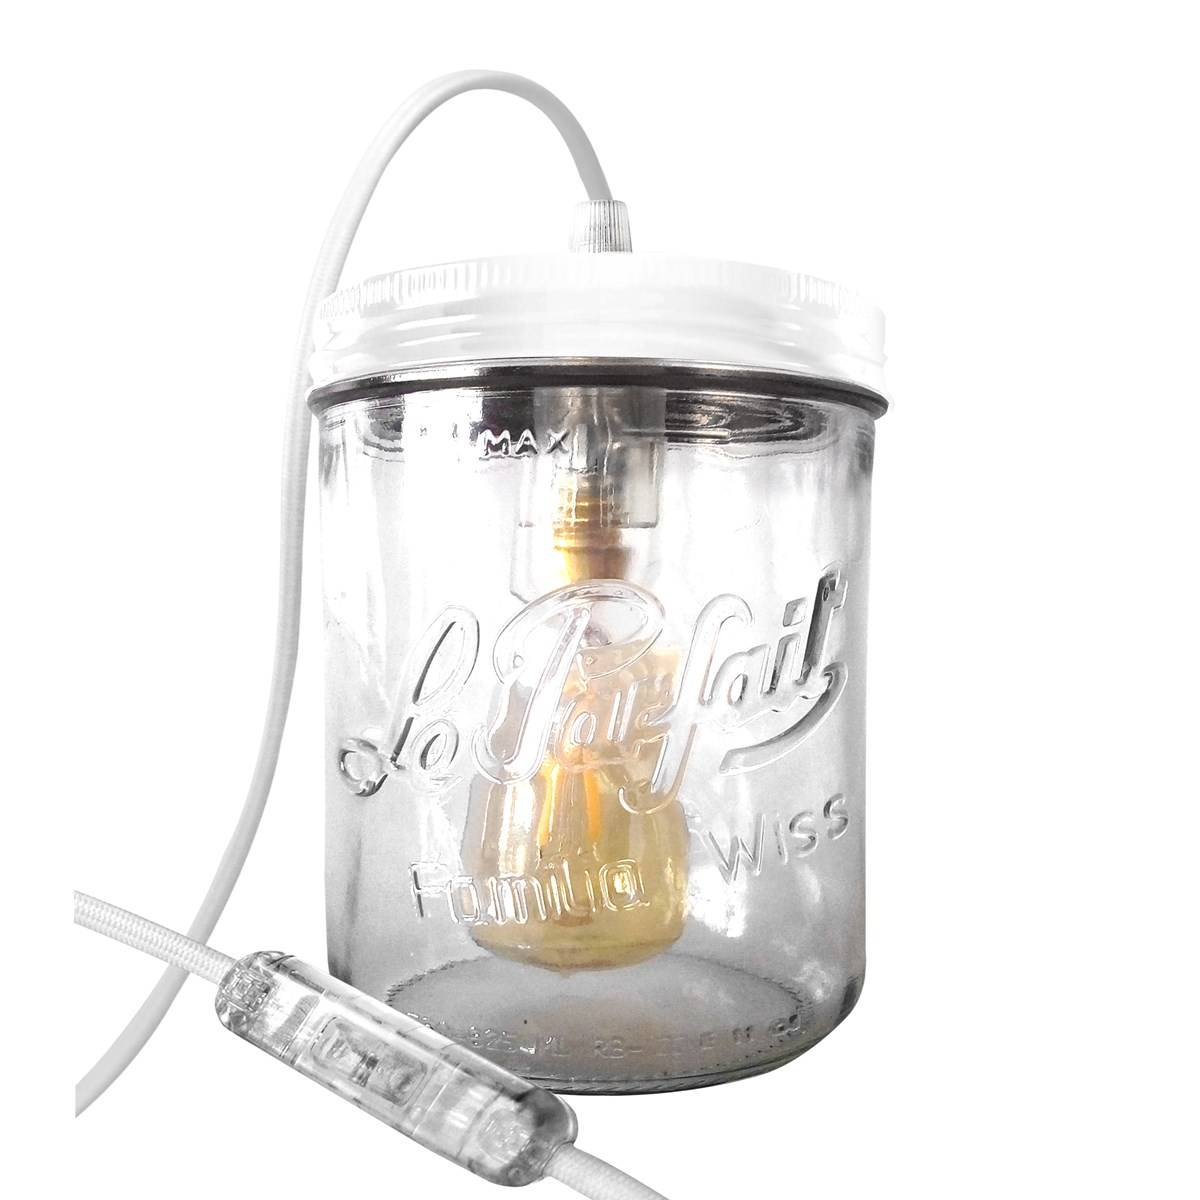 Fenel & Arno Lampe bocal en verre blanc